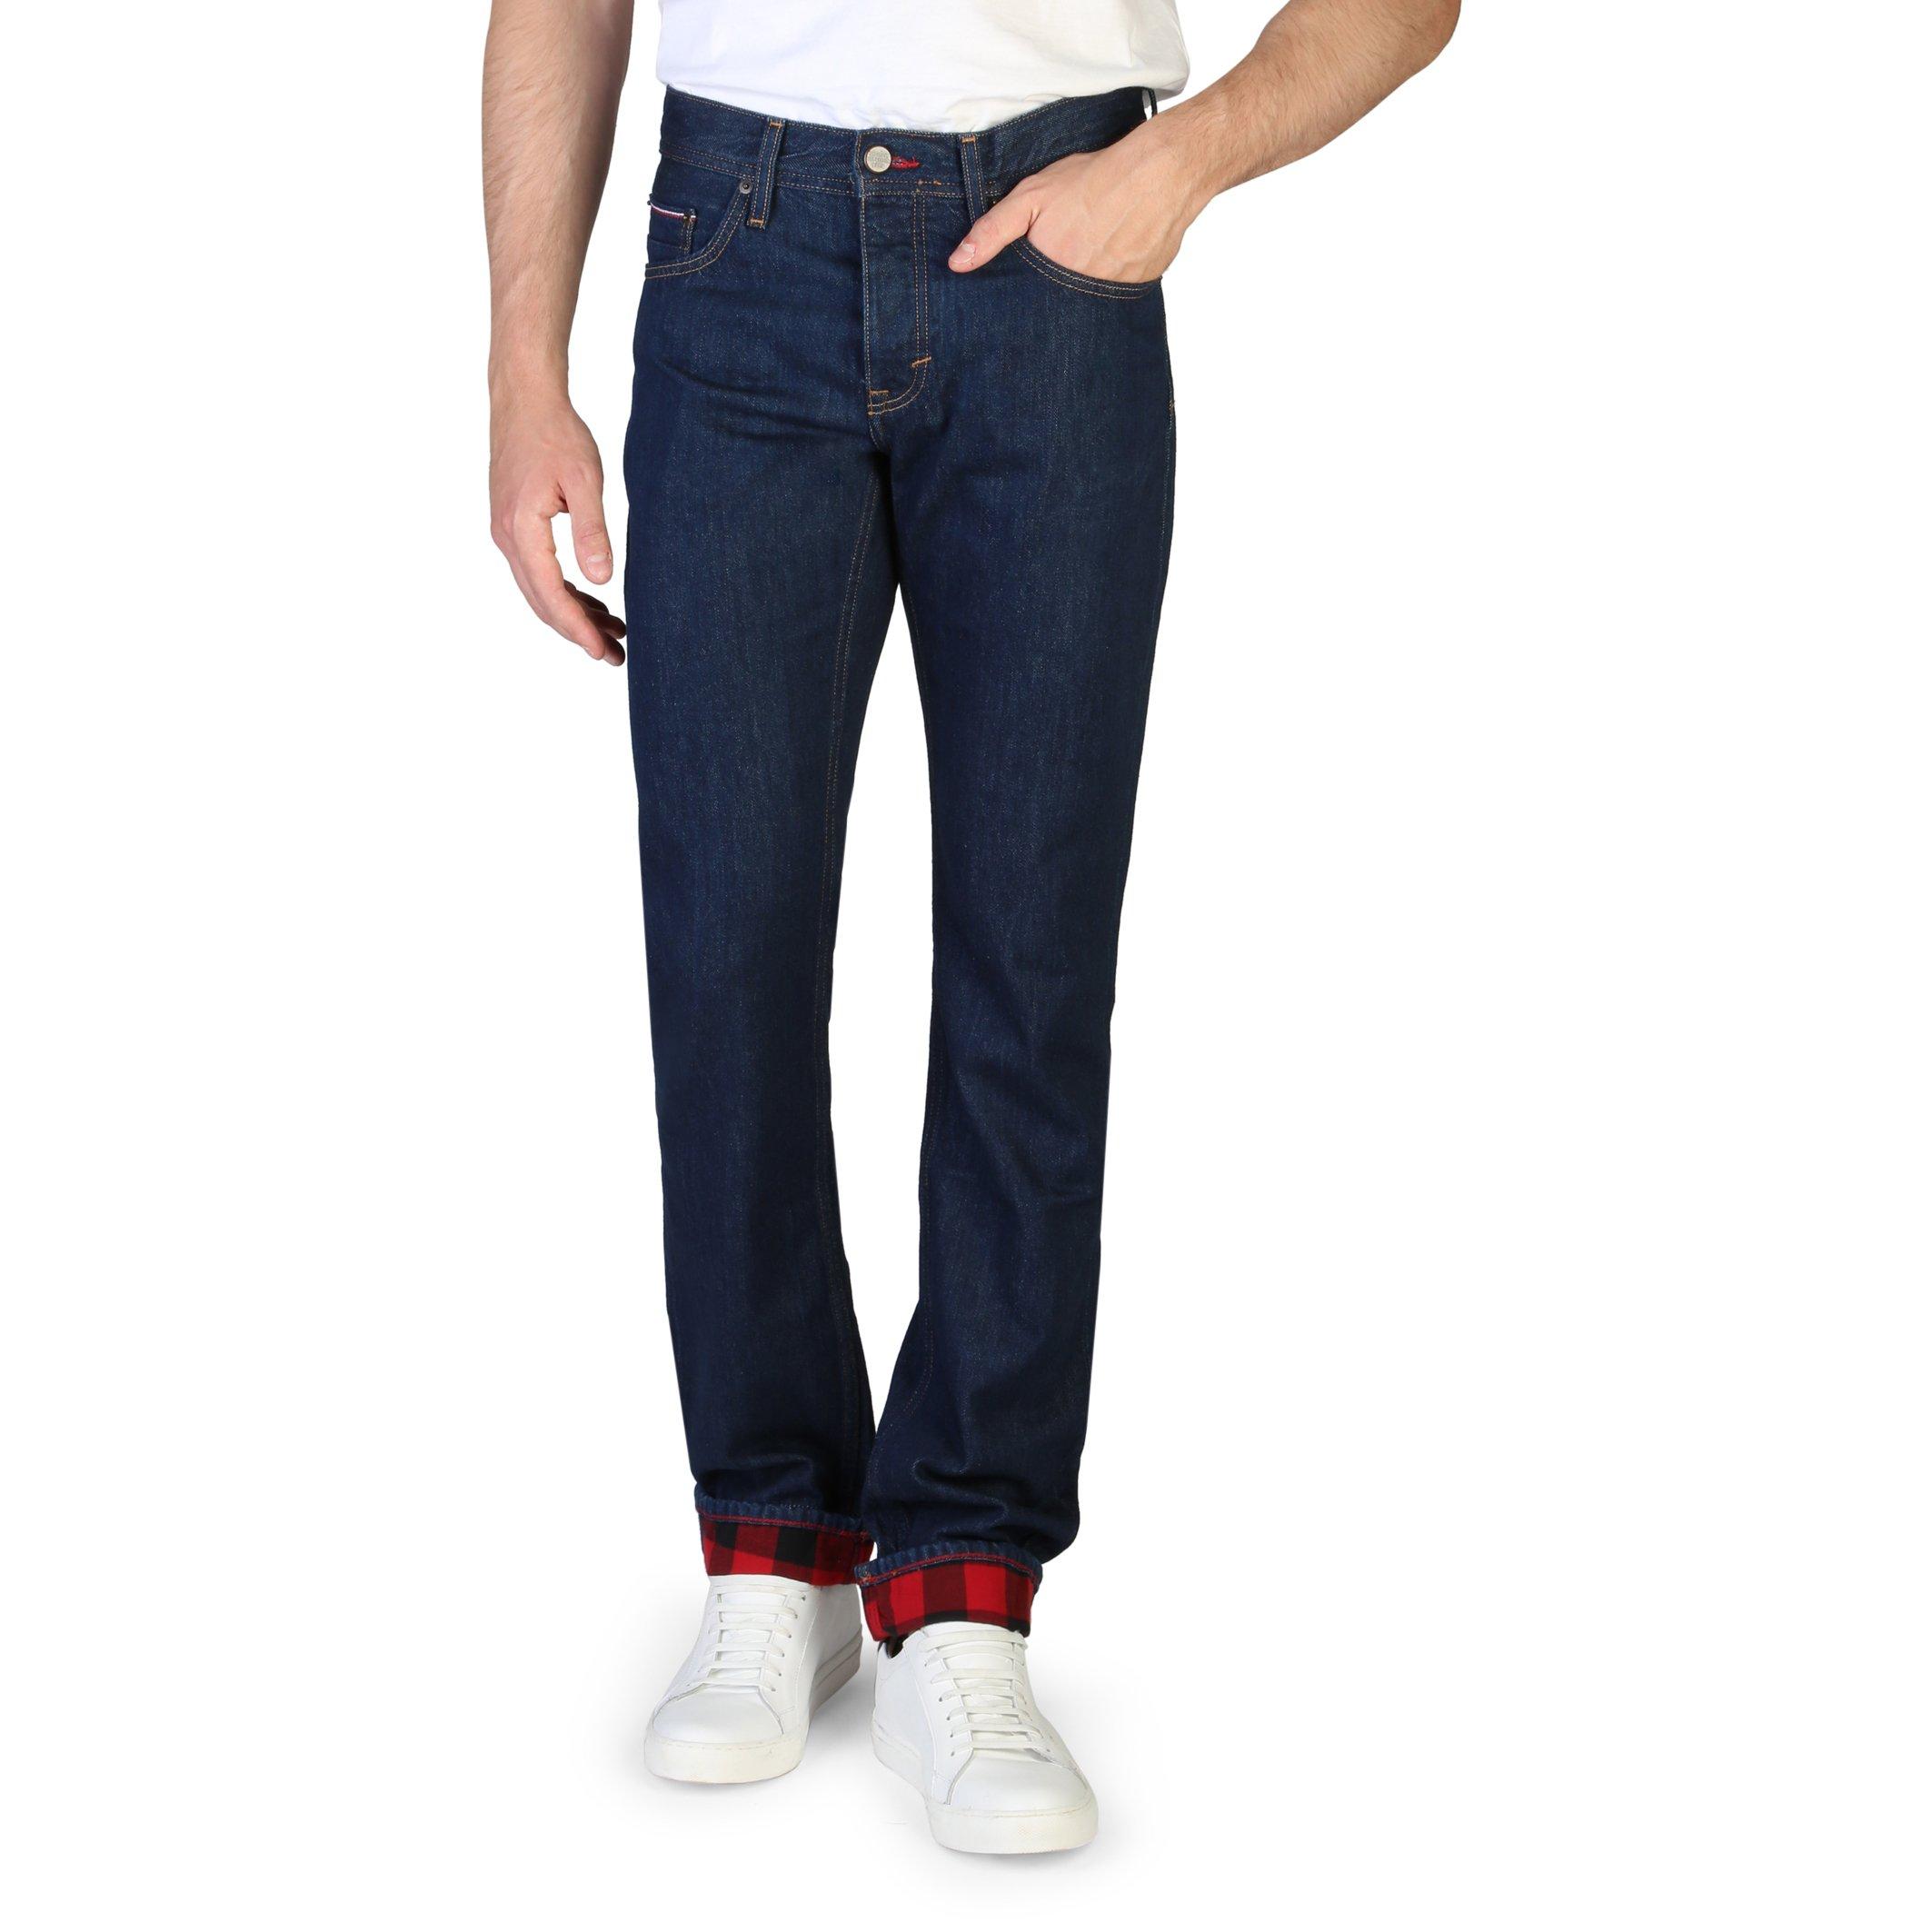 Tommy Hilfiger Men's Jeans Blue MW0MW08115 - blue-3 30